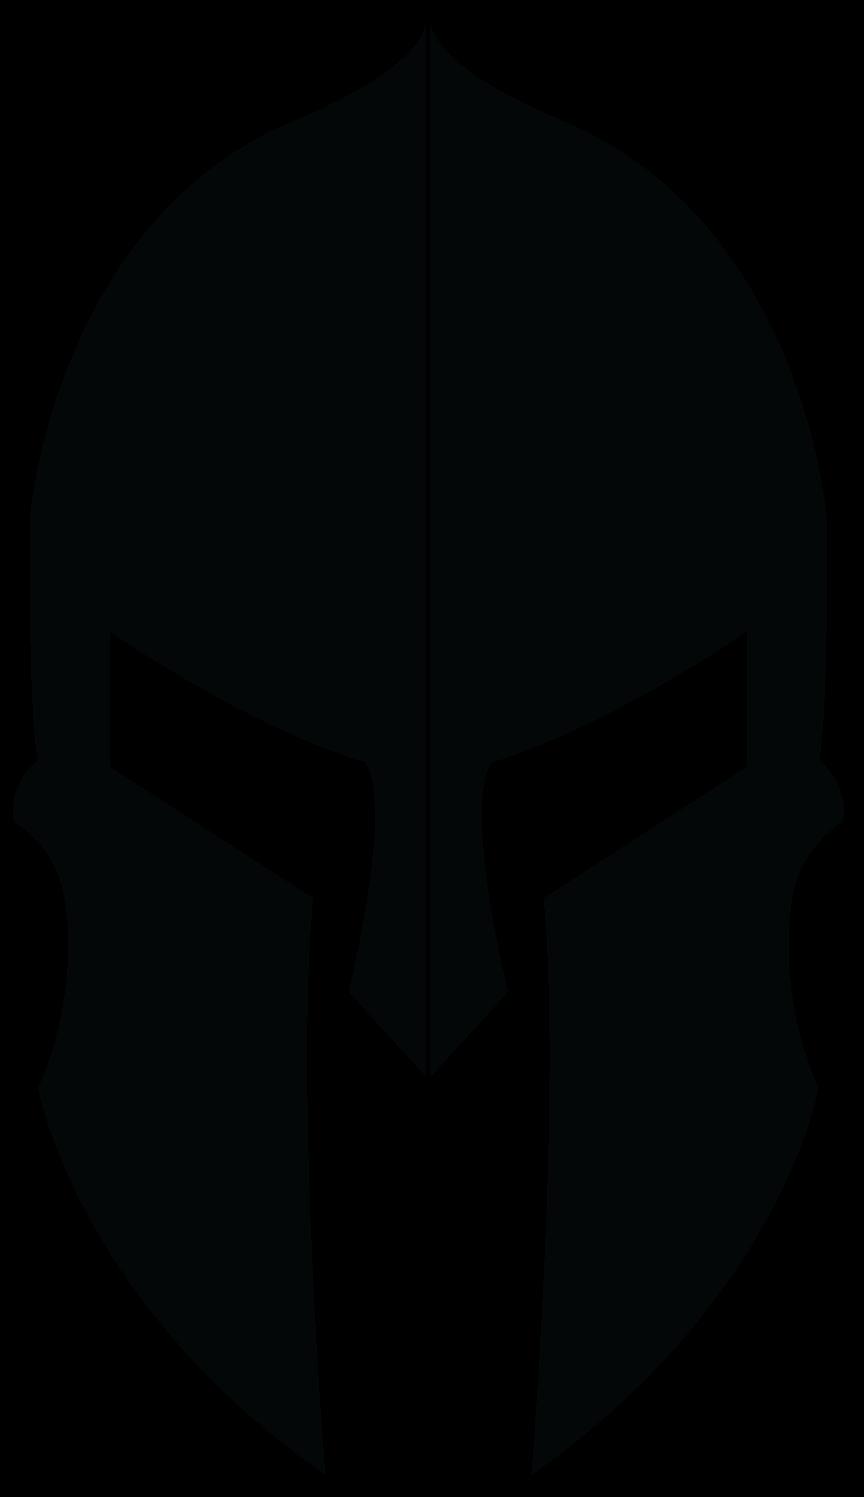 Logo design for Spartan Helmet.